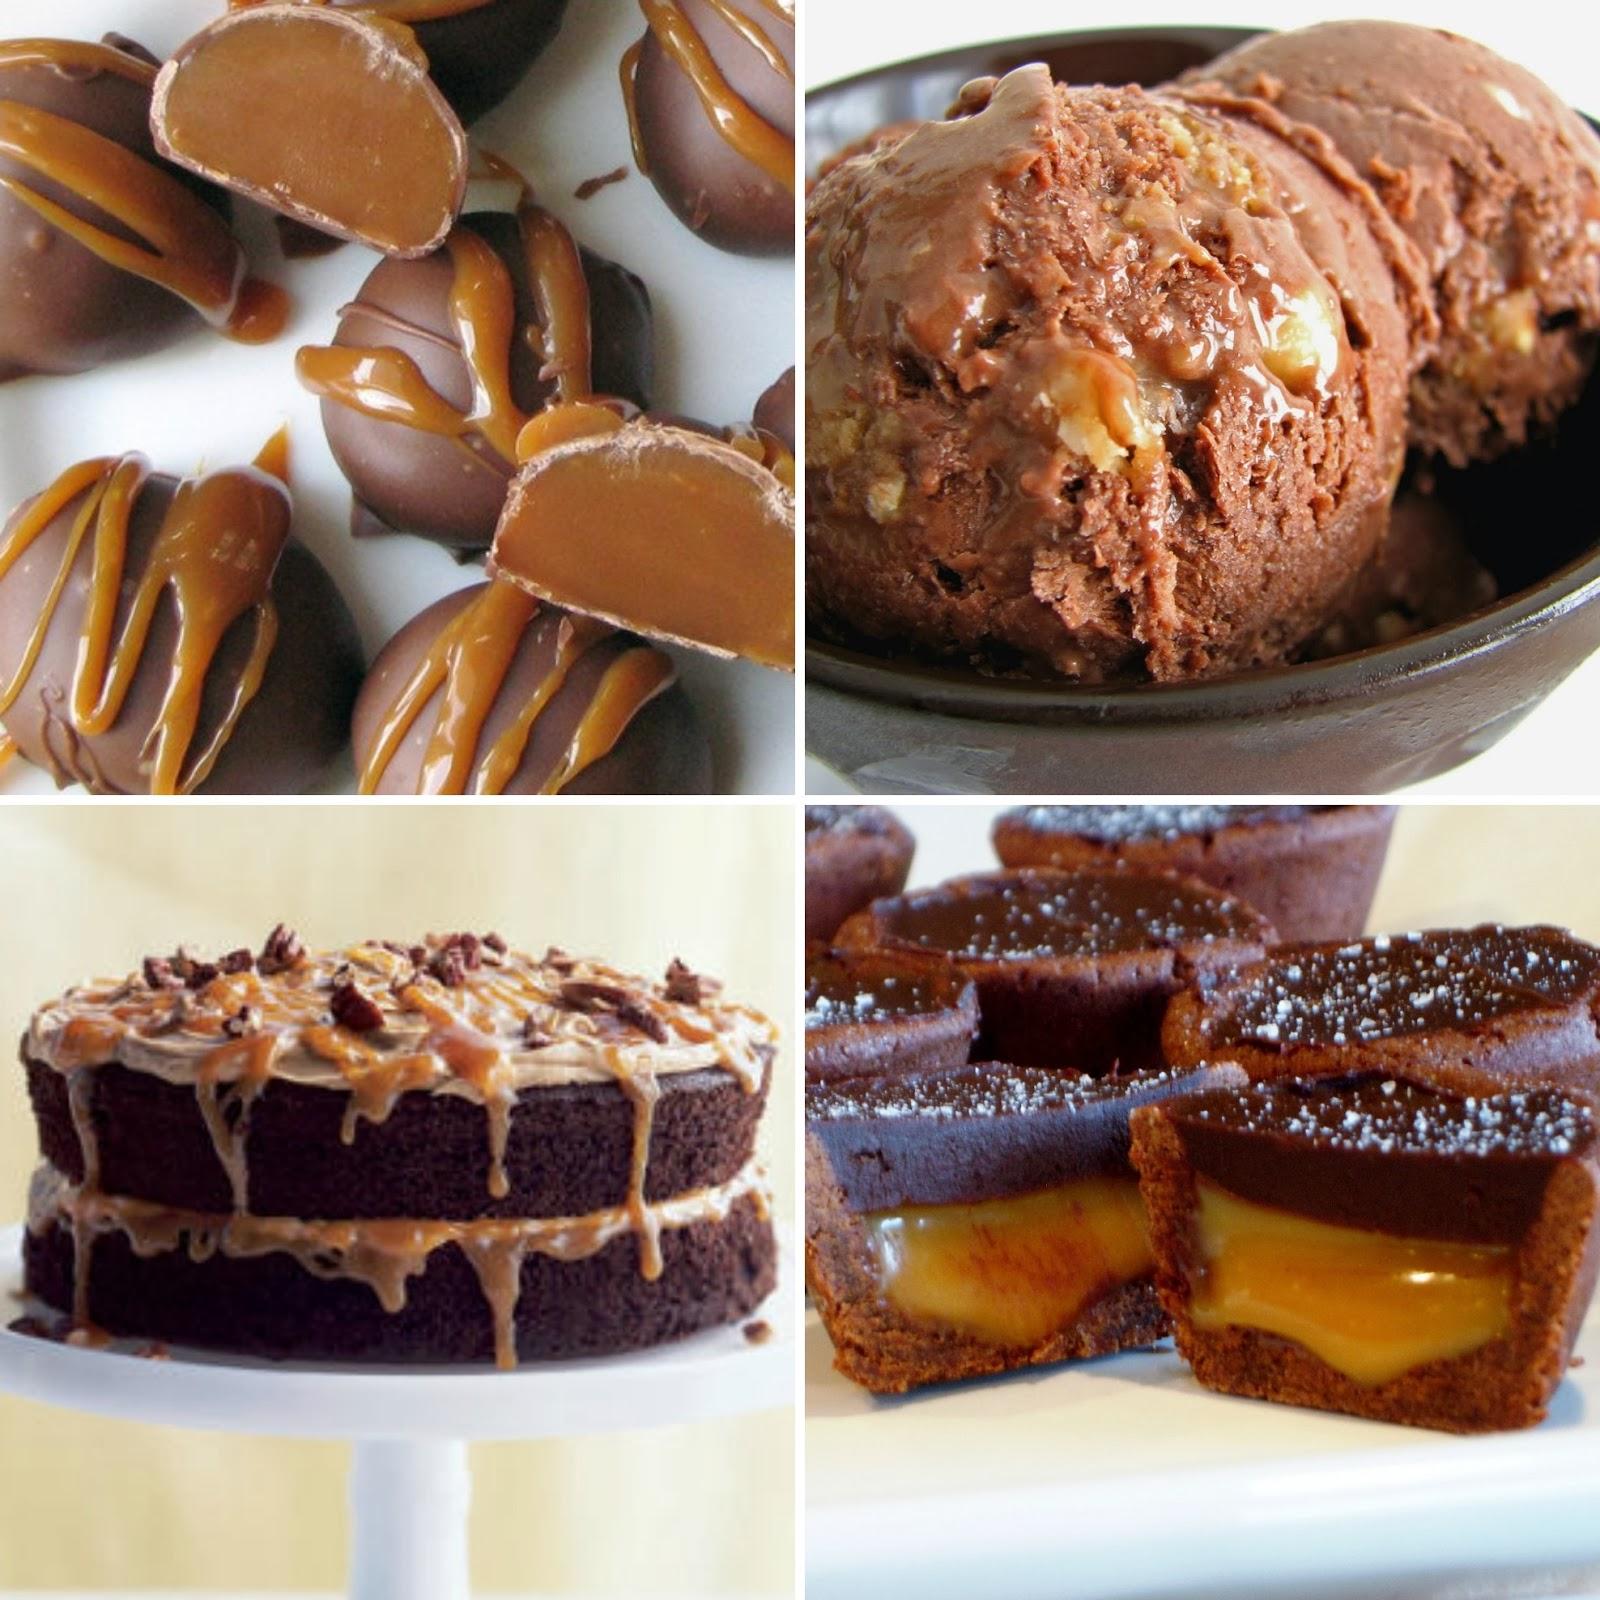 chocolate caramel desserts